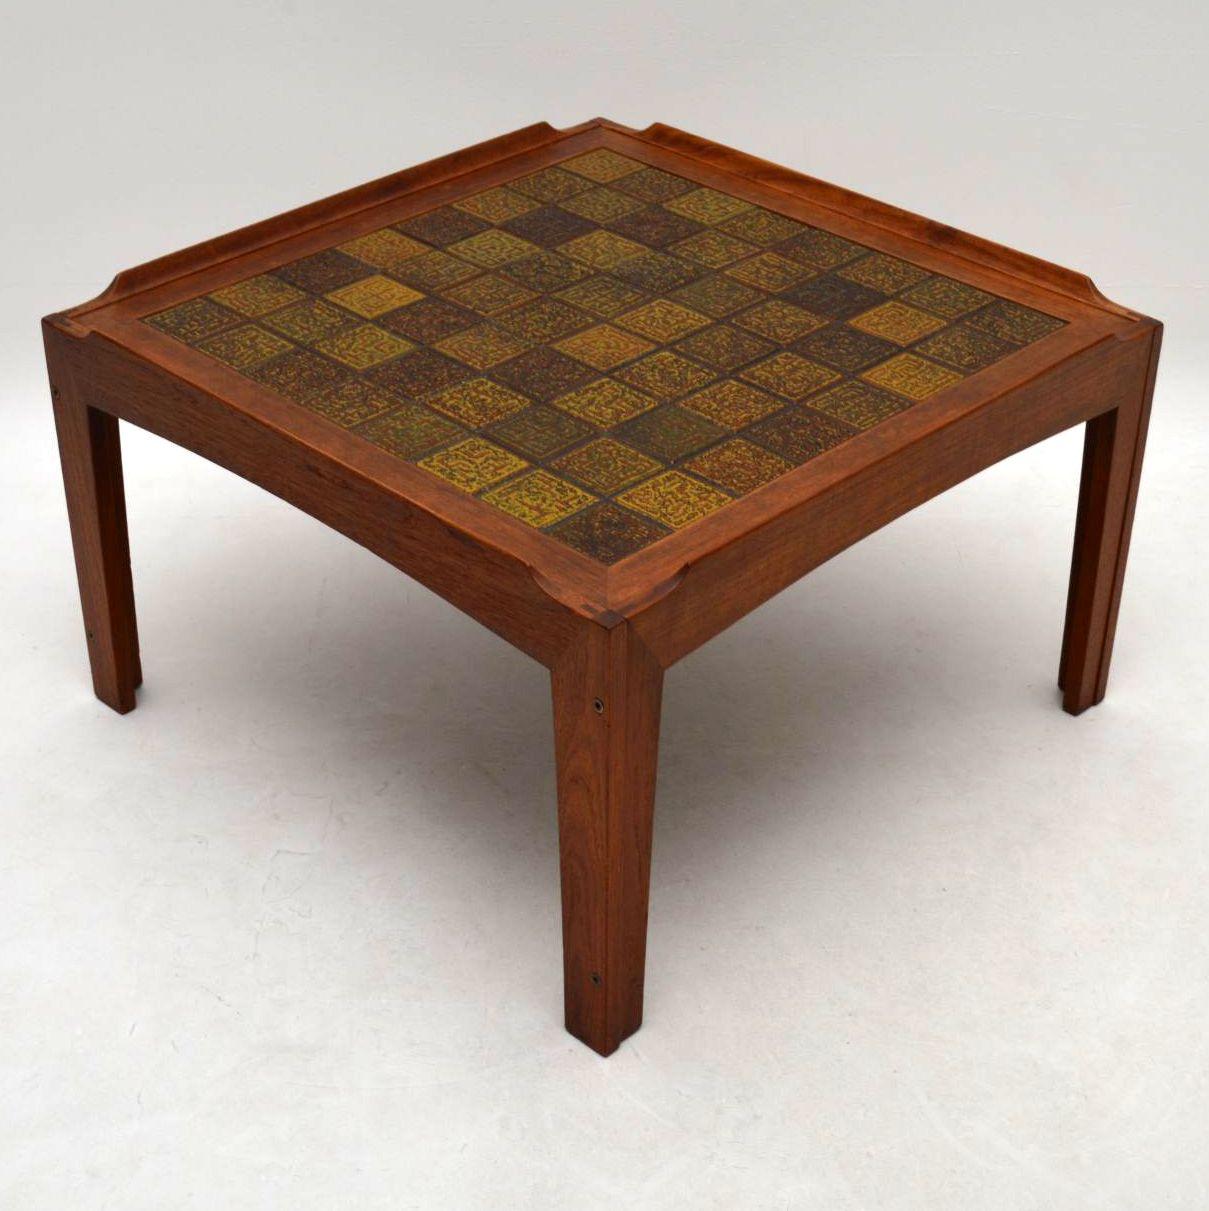 Danish Teak Tiled Top Retro Coffee Table Vintage 1960's